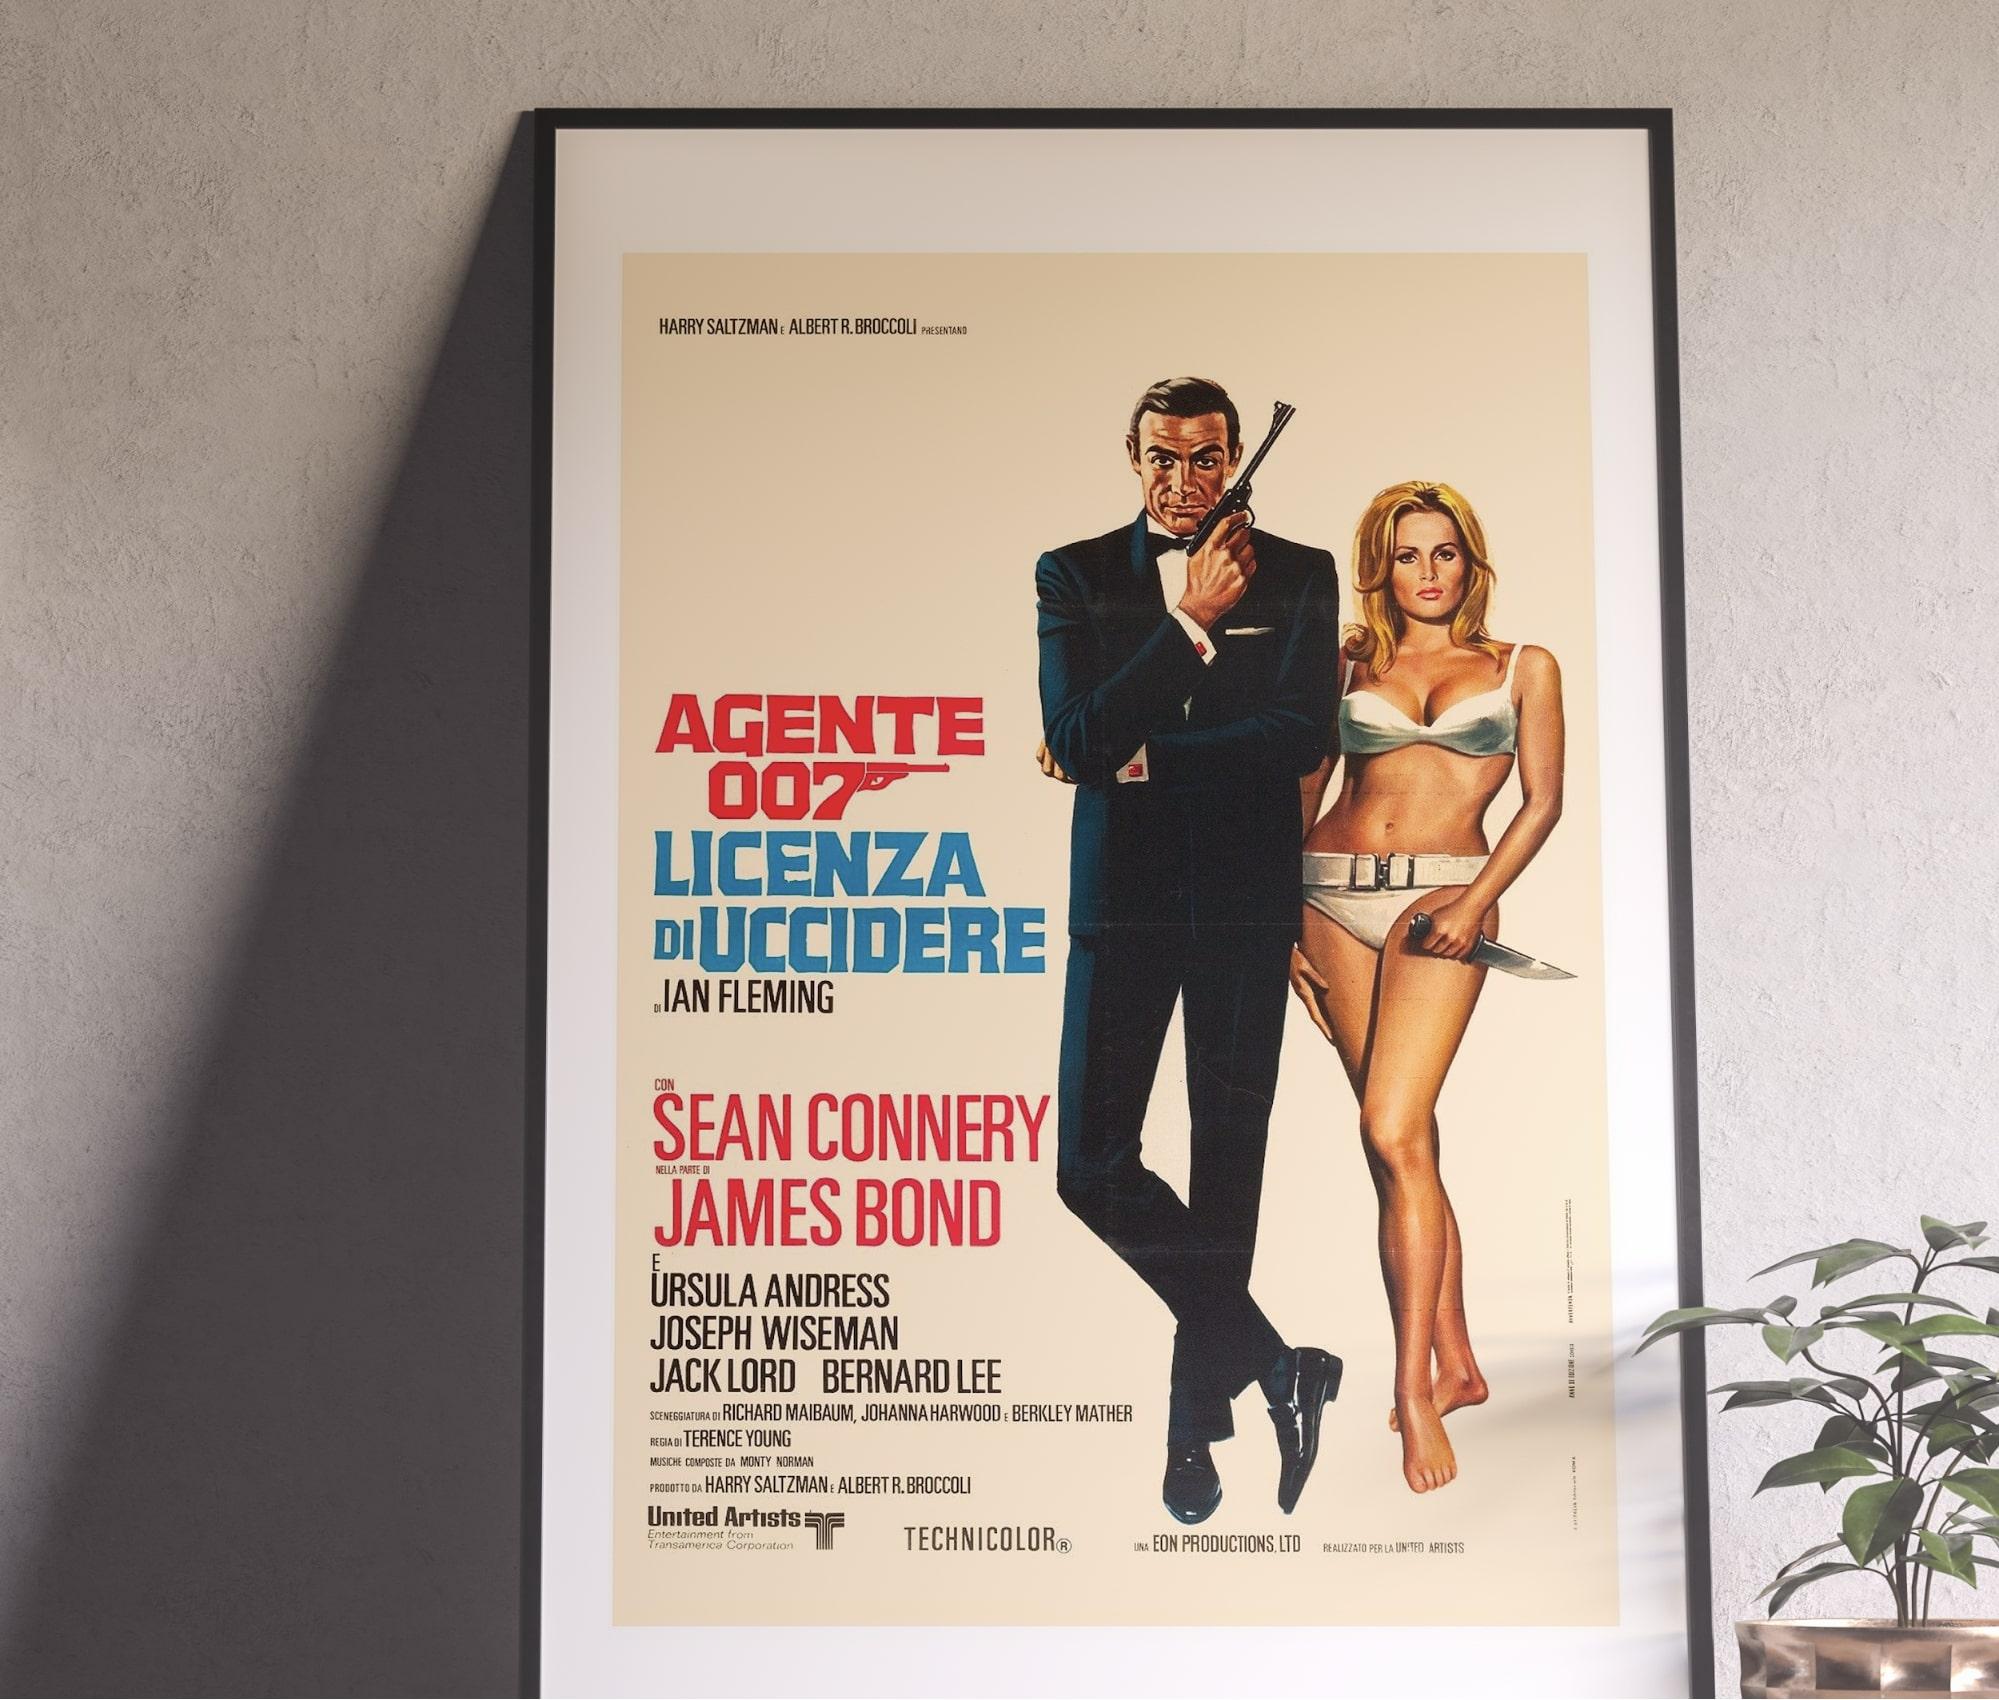 Image of a vintage James Bond movie poster in a frame